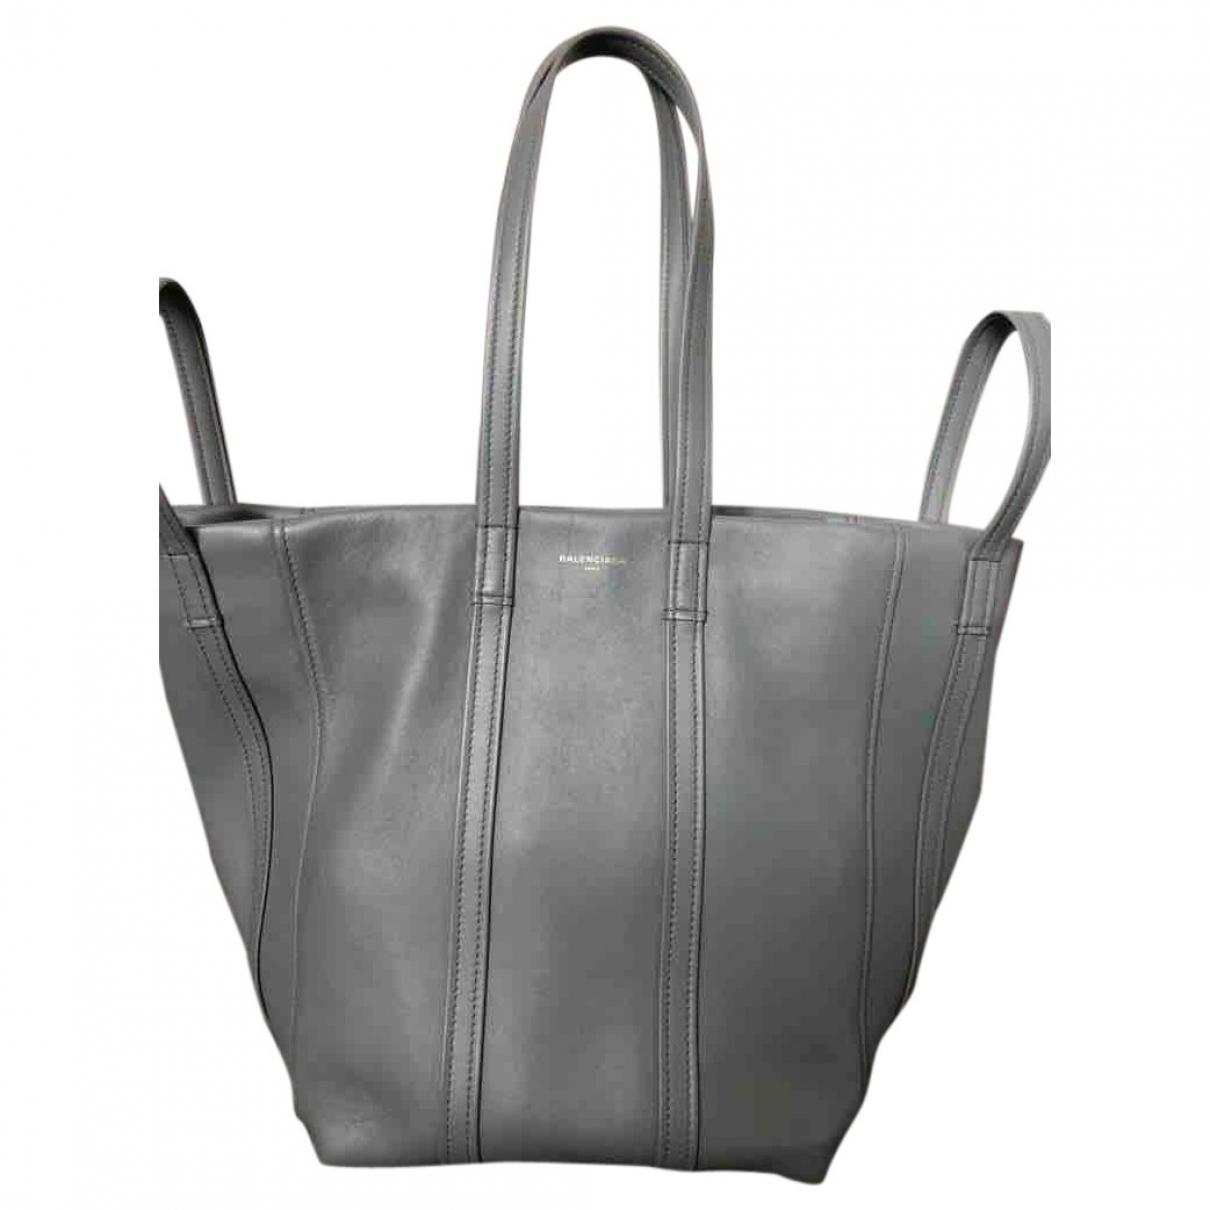 Balenciaga - Sac a main Laundry Cabas pour femme en cuir - gris